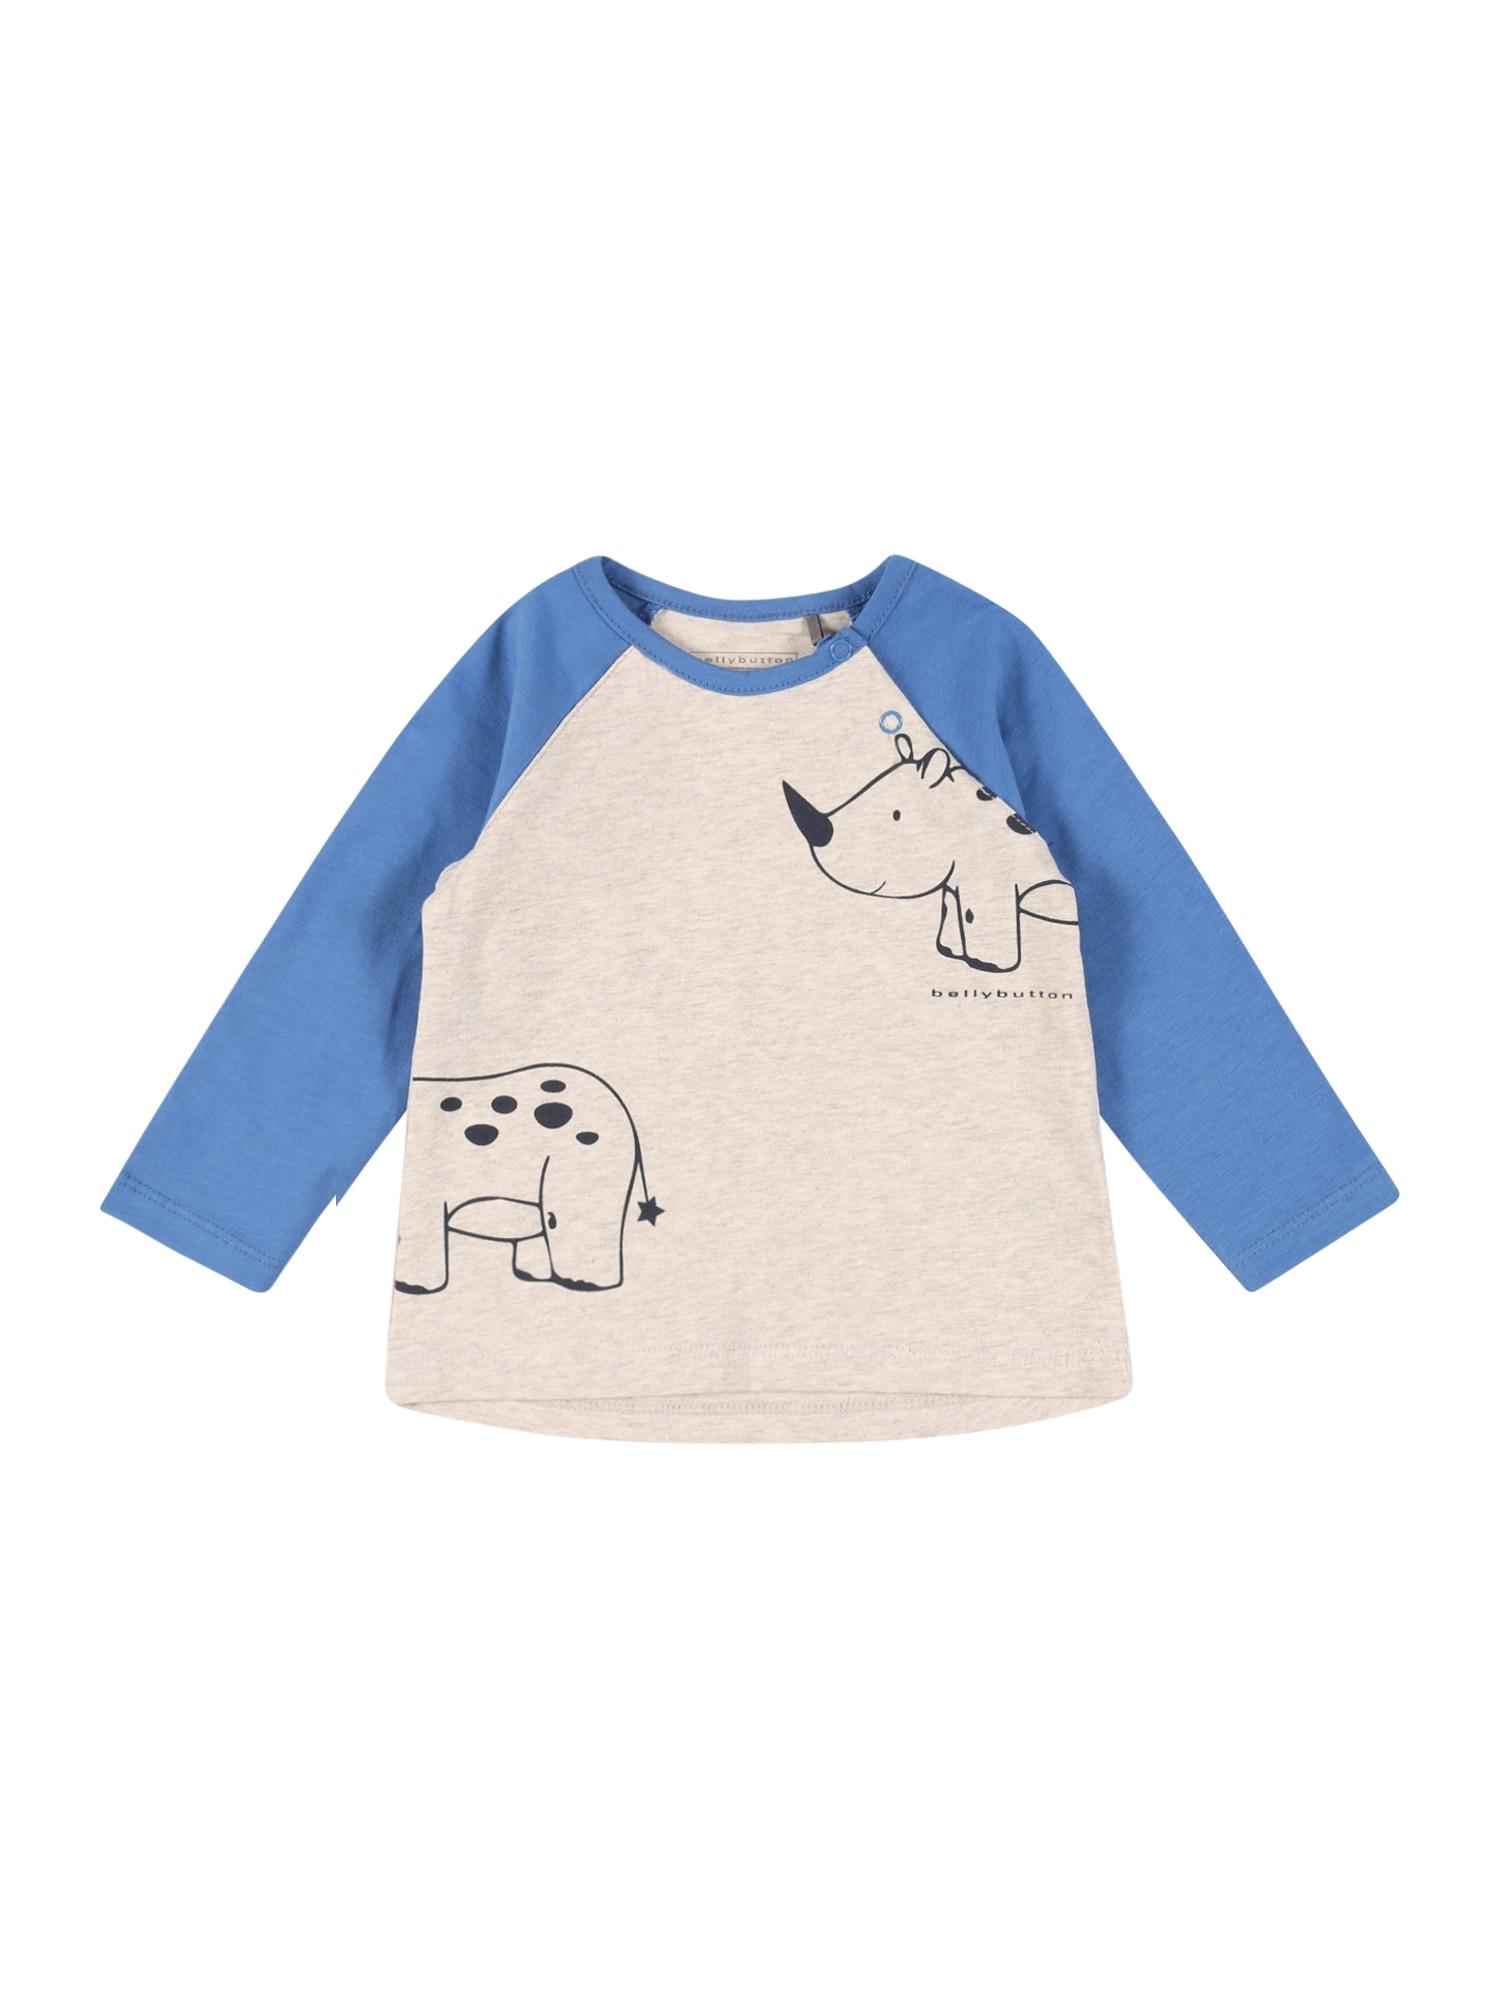 "BELLYBUTTON Marškinėliai glaisto spalva / sodri mėlyna (""karališka"") / nakties mėlyna"